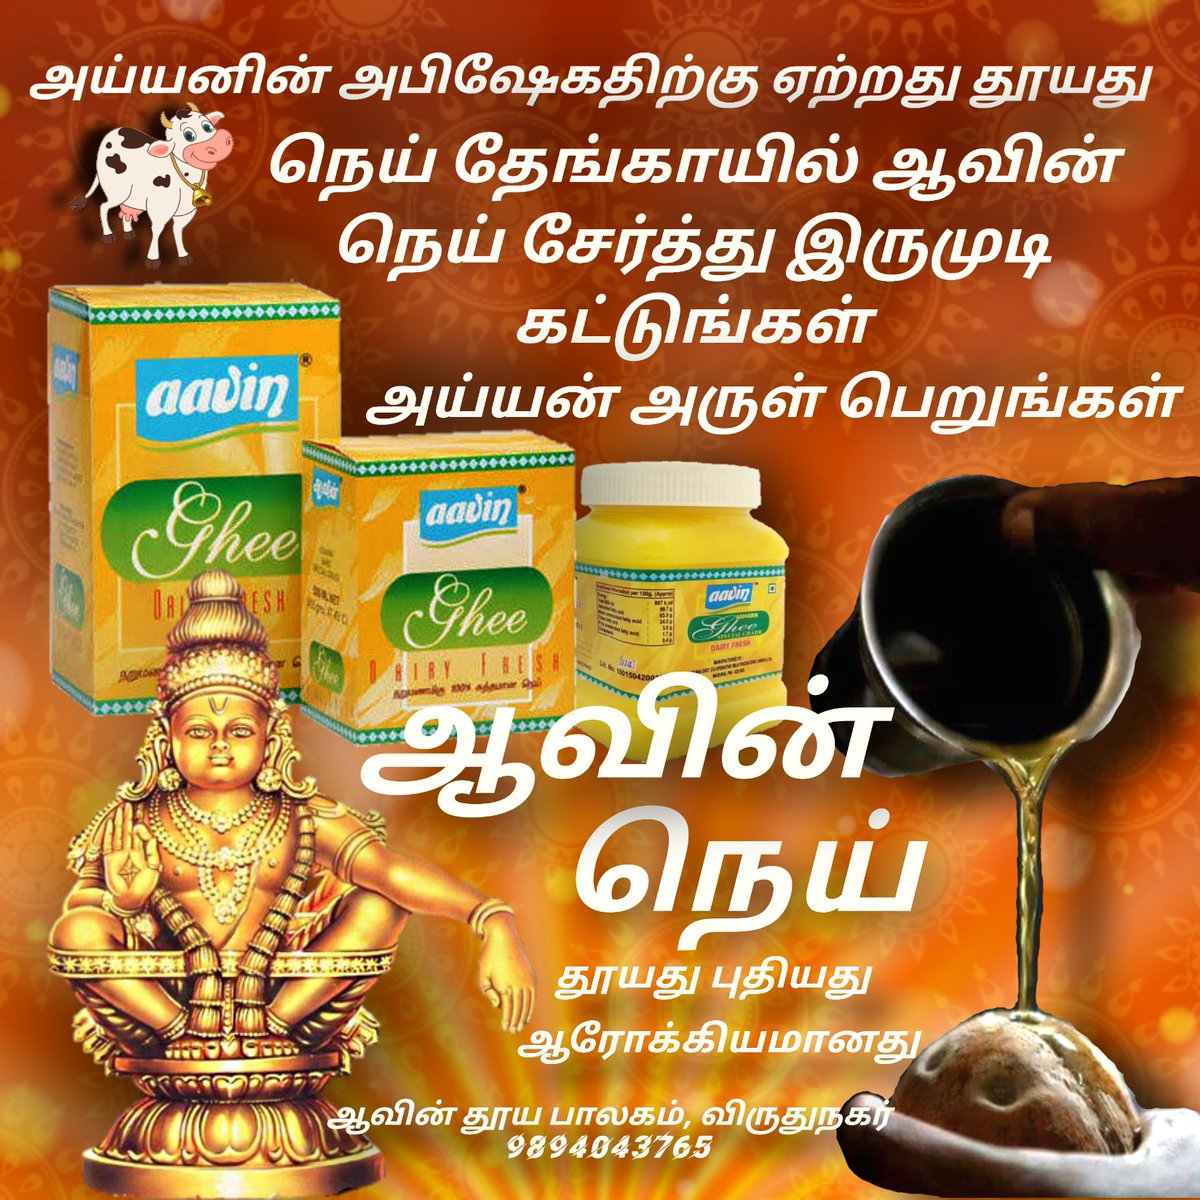 #aavin_fresh_milk_stall #virudhunagar #aavin #aavin_ghee #ghee #irumudi #இருமுடி #தேங்காய் #அபிஷேகம் #சபரிமலை #ஐயப்பன் #sabarimala #ayyappan https://t.co/PKVaGiYIED